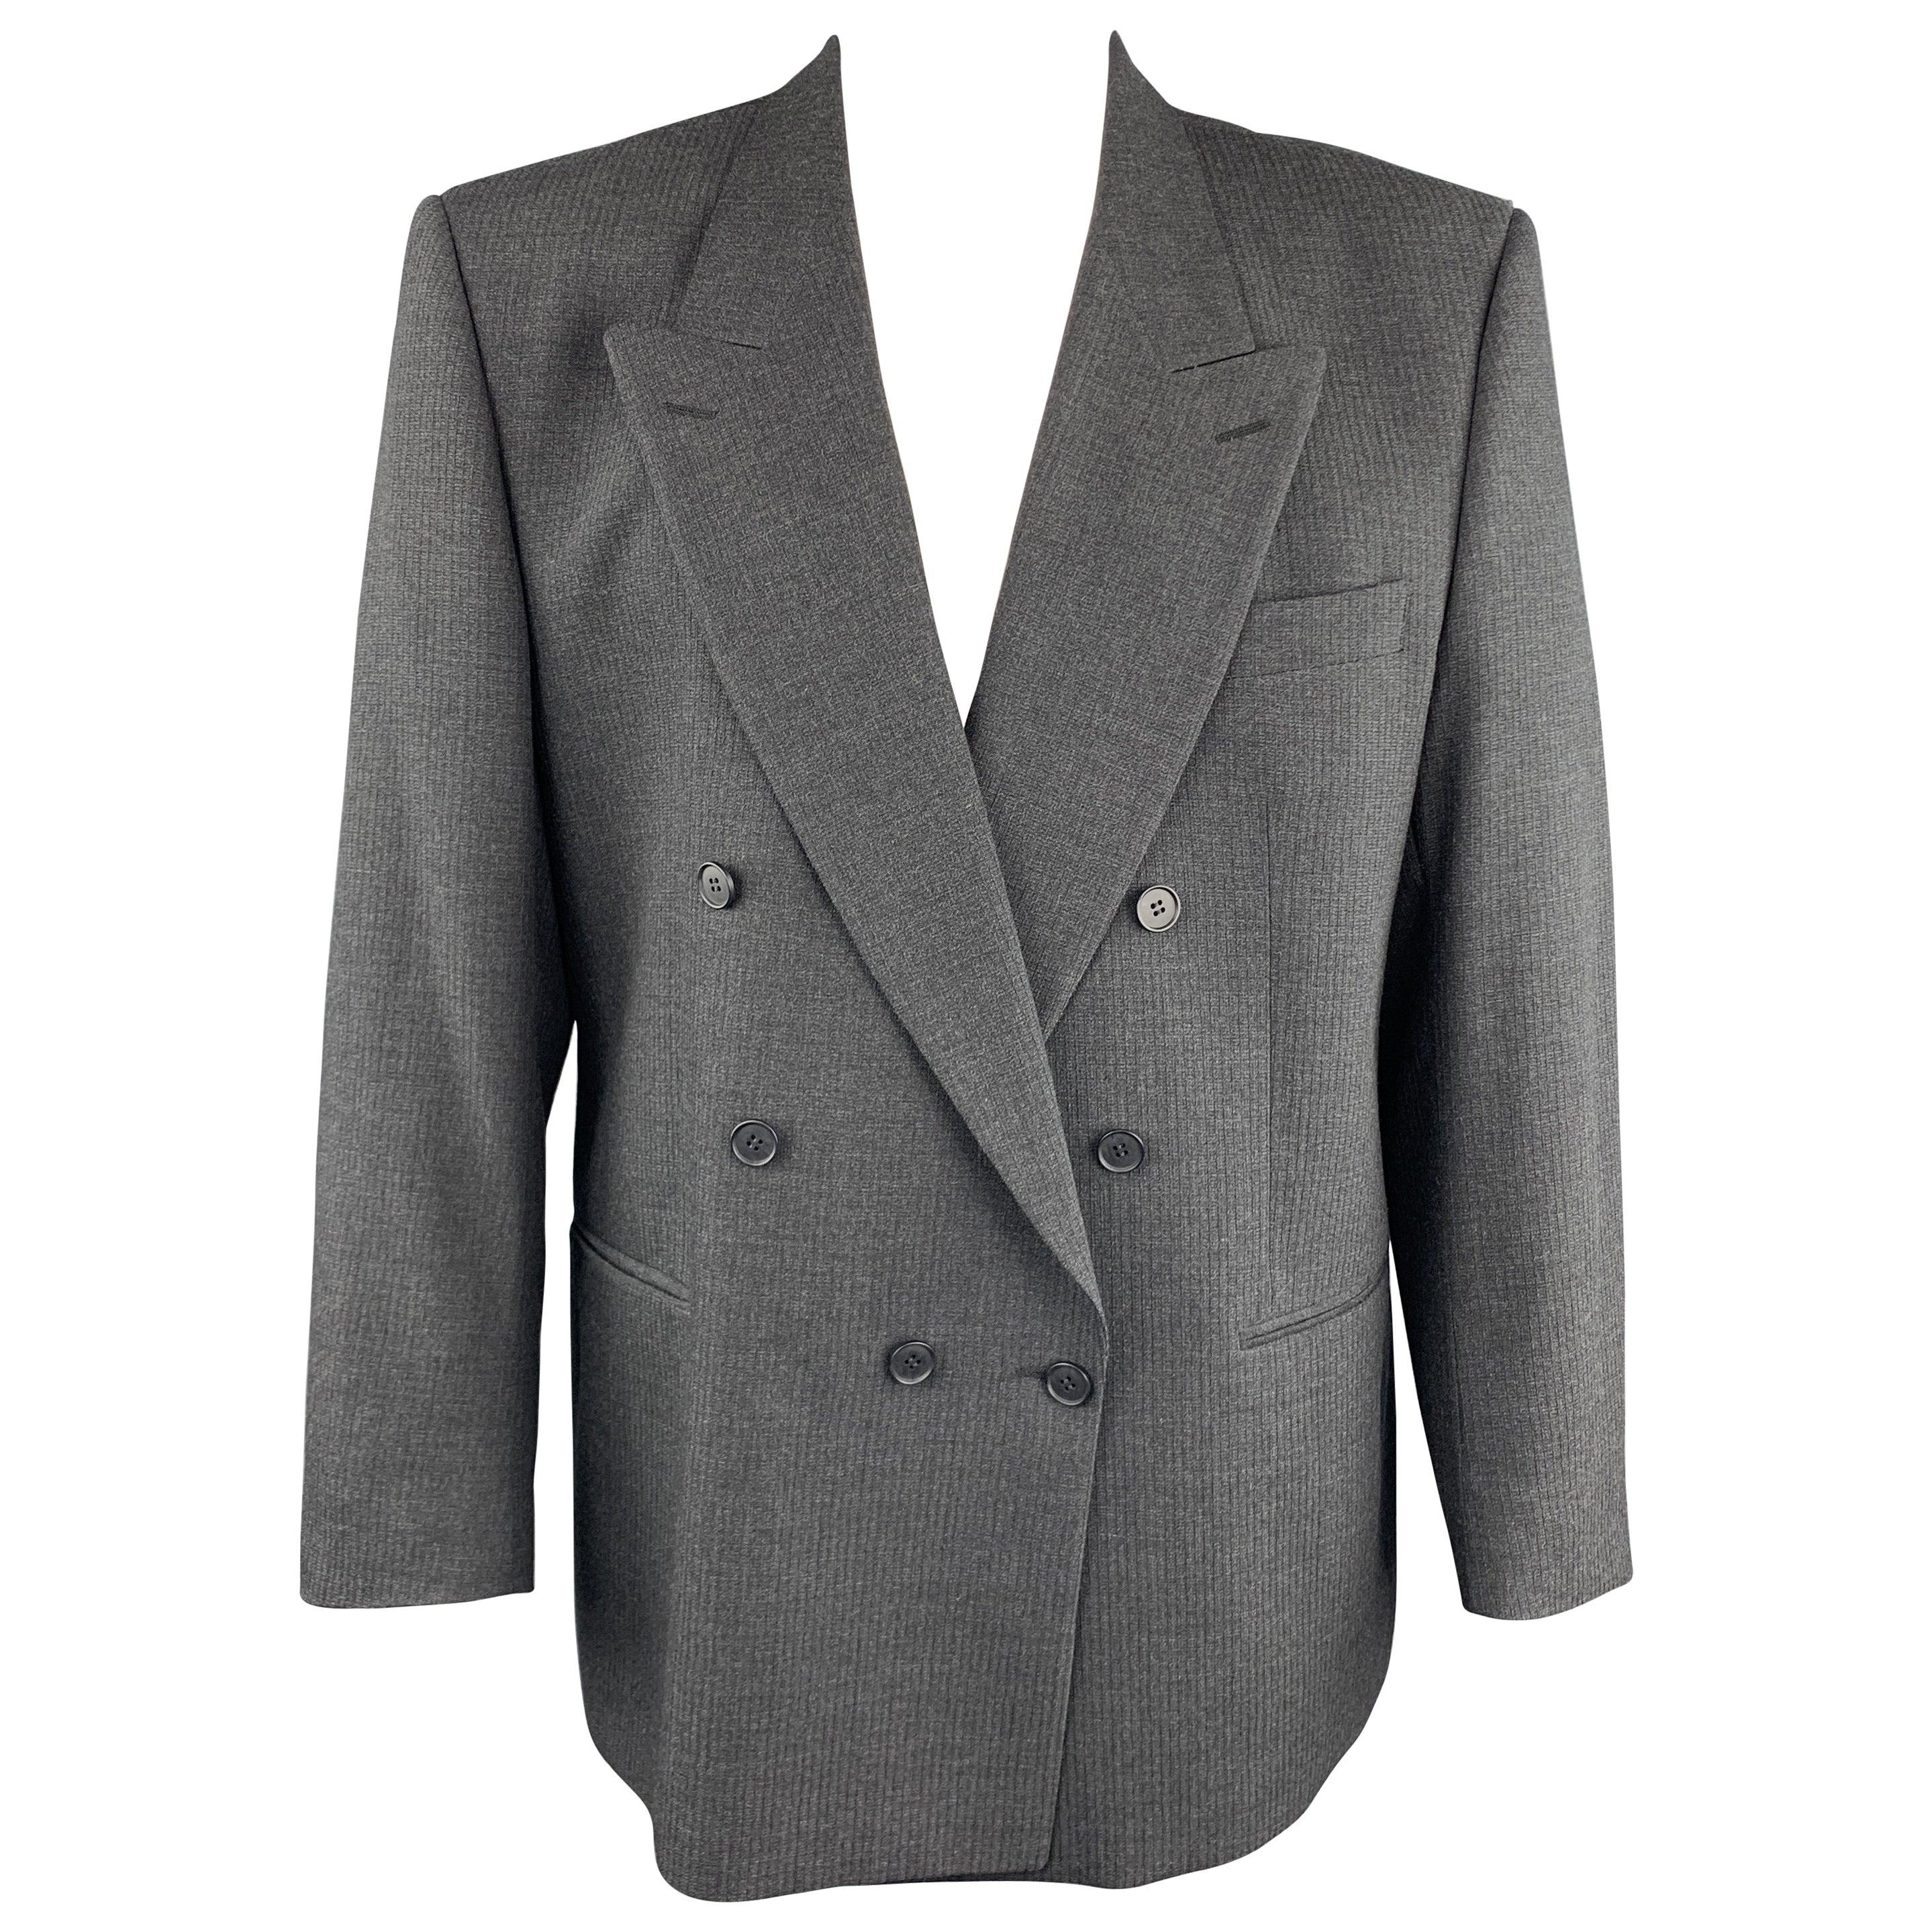 YVES SAINT LAURENT 46 Regular Dark Gray Textured Wool Peak Lapel Sport Coat